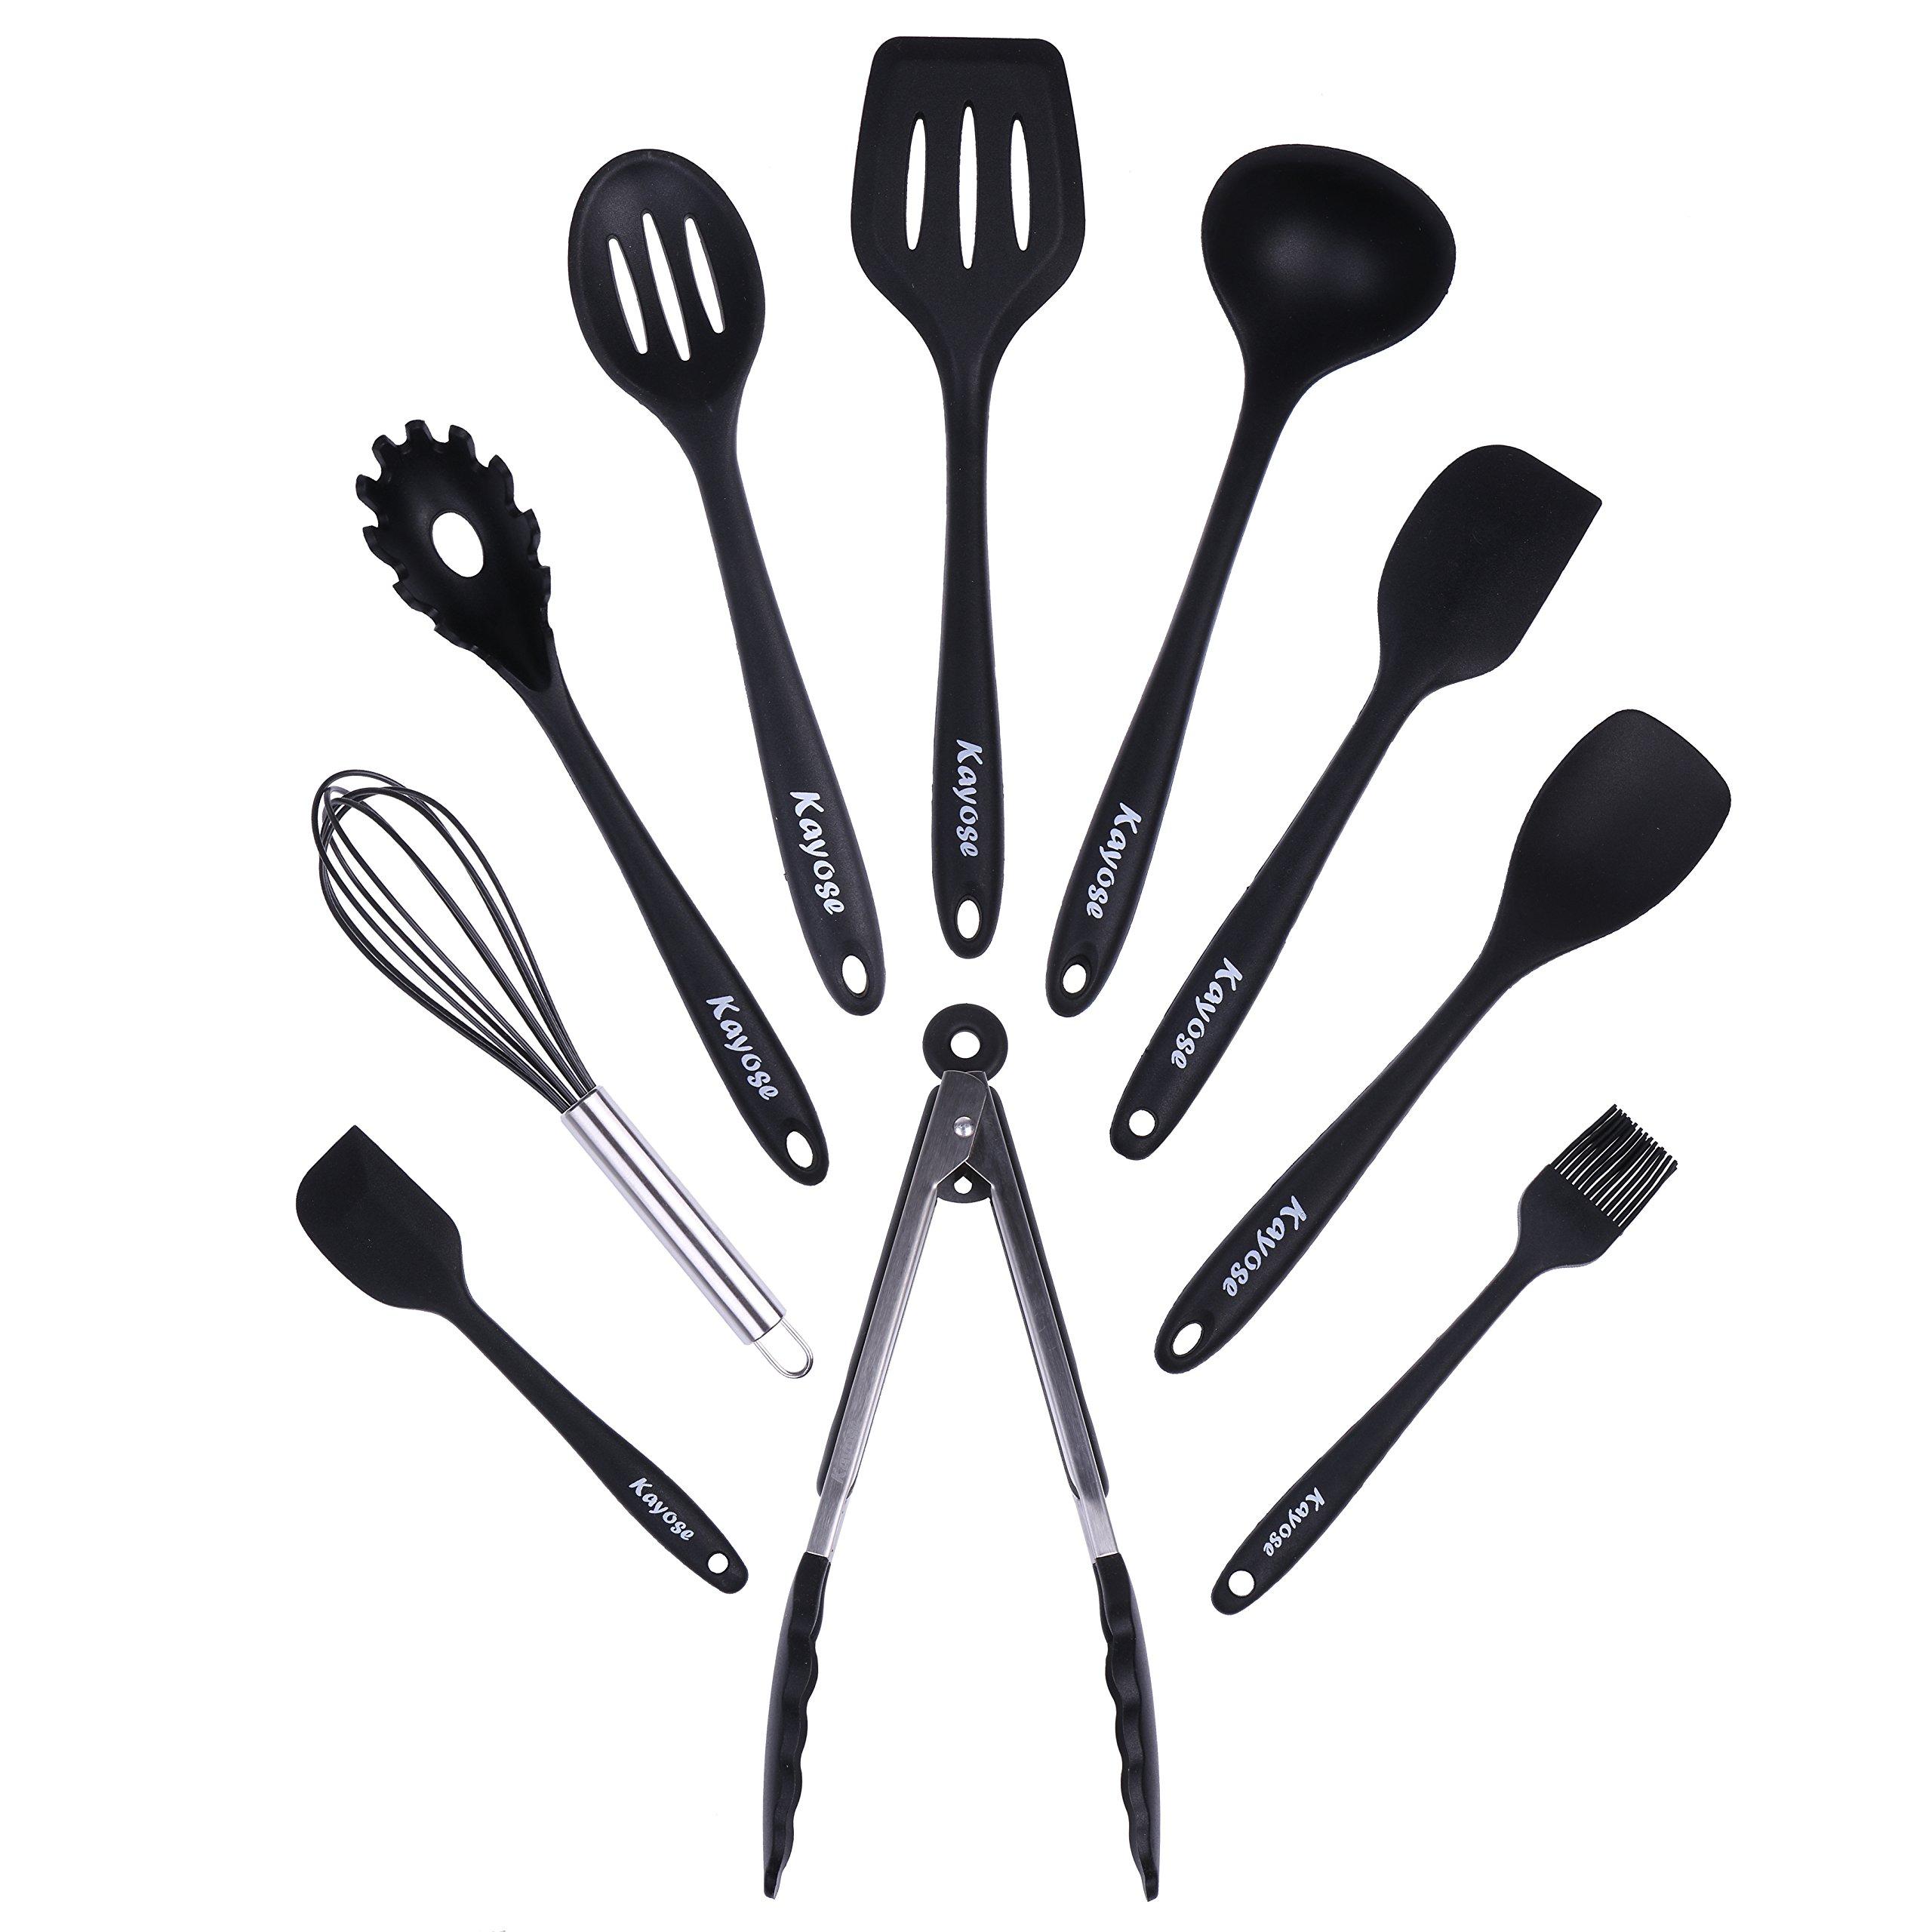 Kayose Premium Silicone Kitchen Utensil Set - 10-Piece Heat Resistant Non-Scratch Cooking Essential Accessories Bundle - Great for Cooking & BBQ - Ergonomic Handle Design - Classic Black